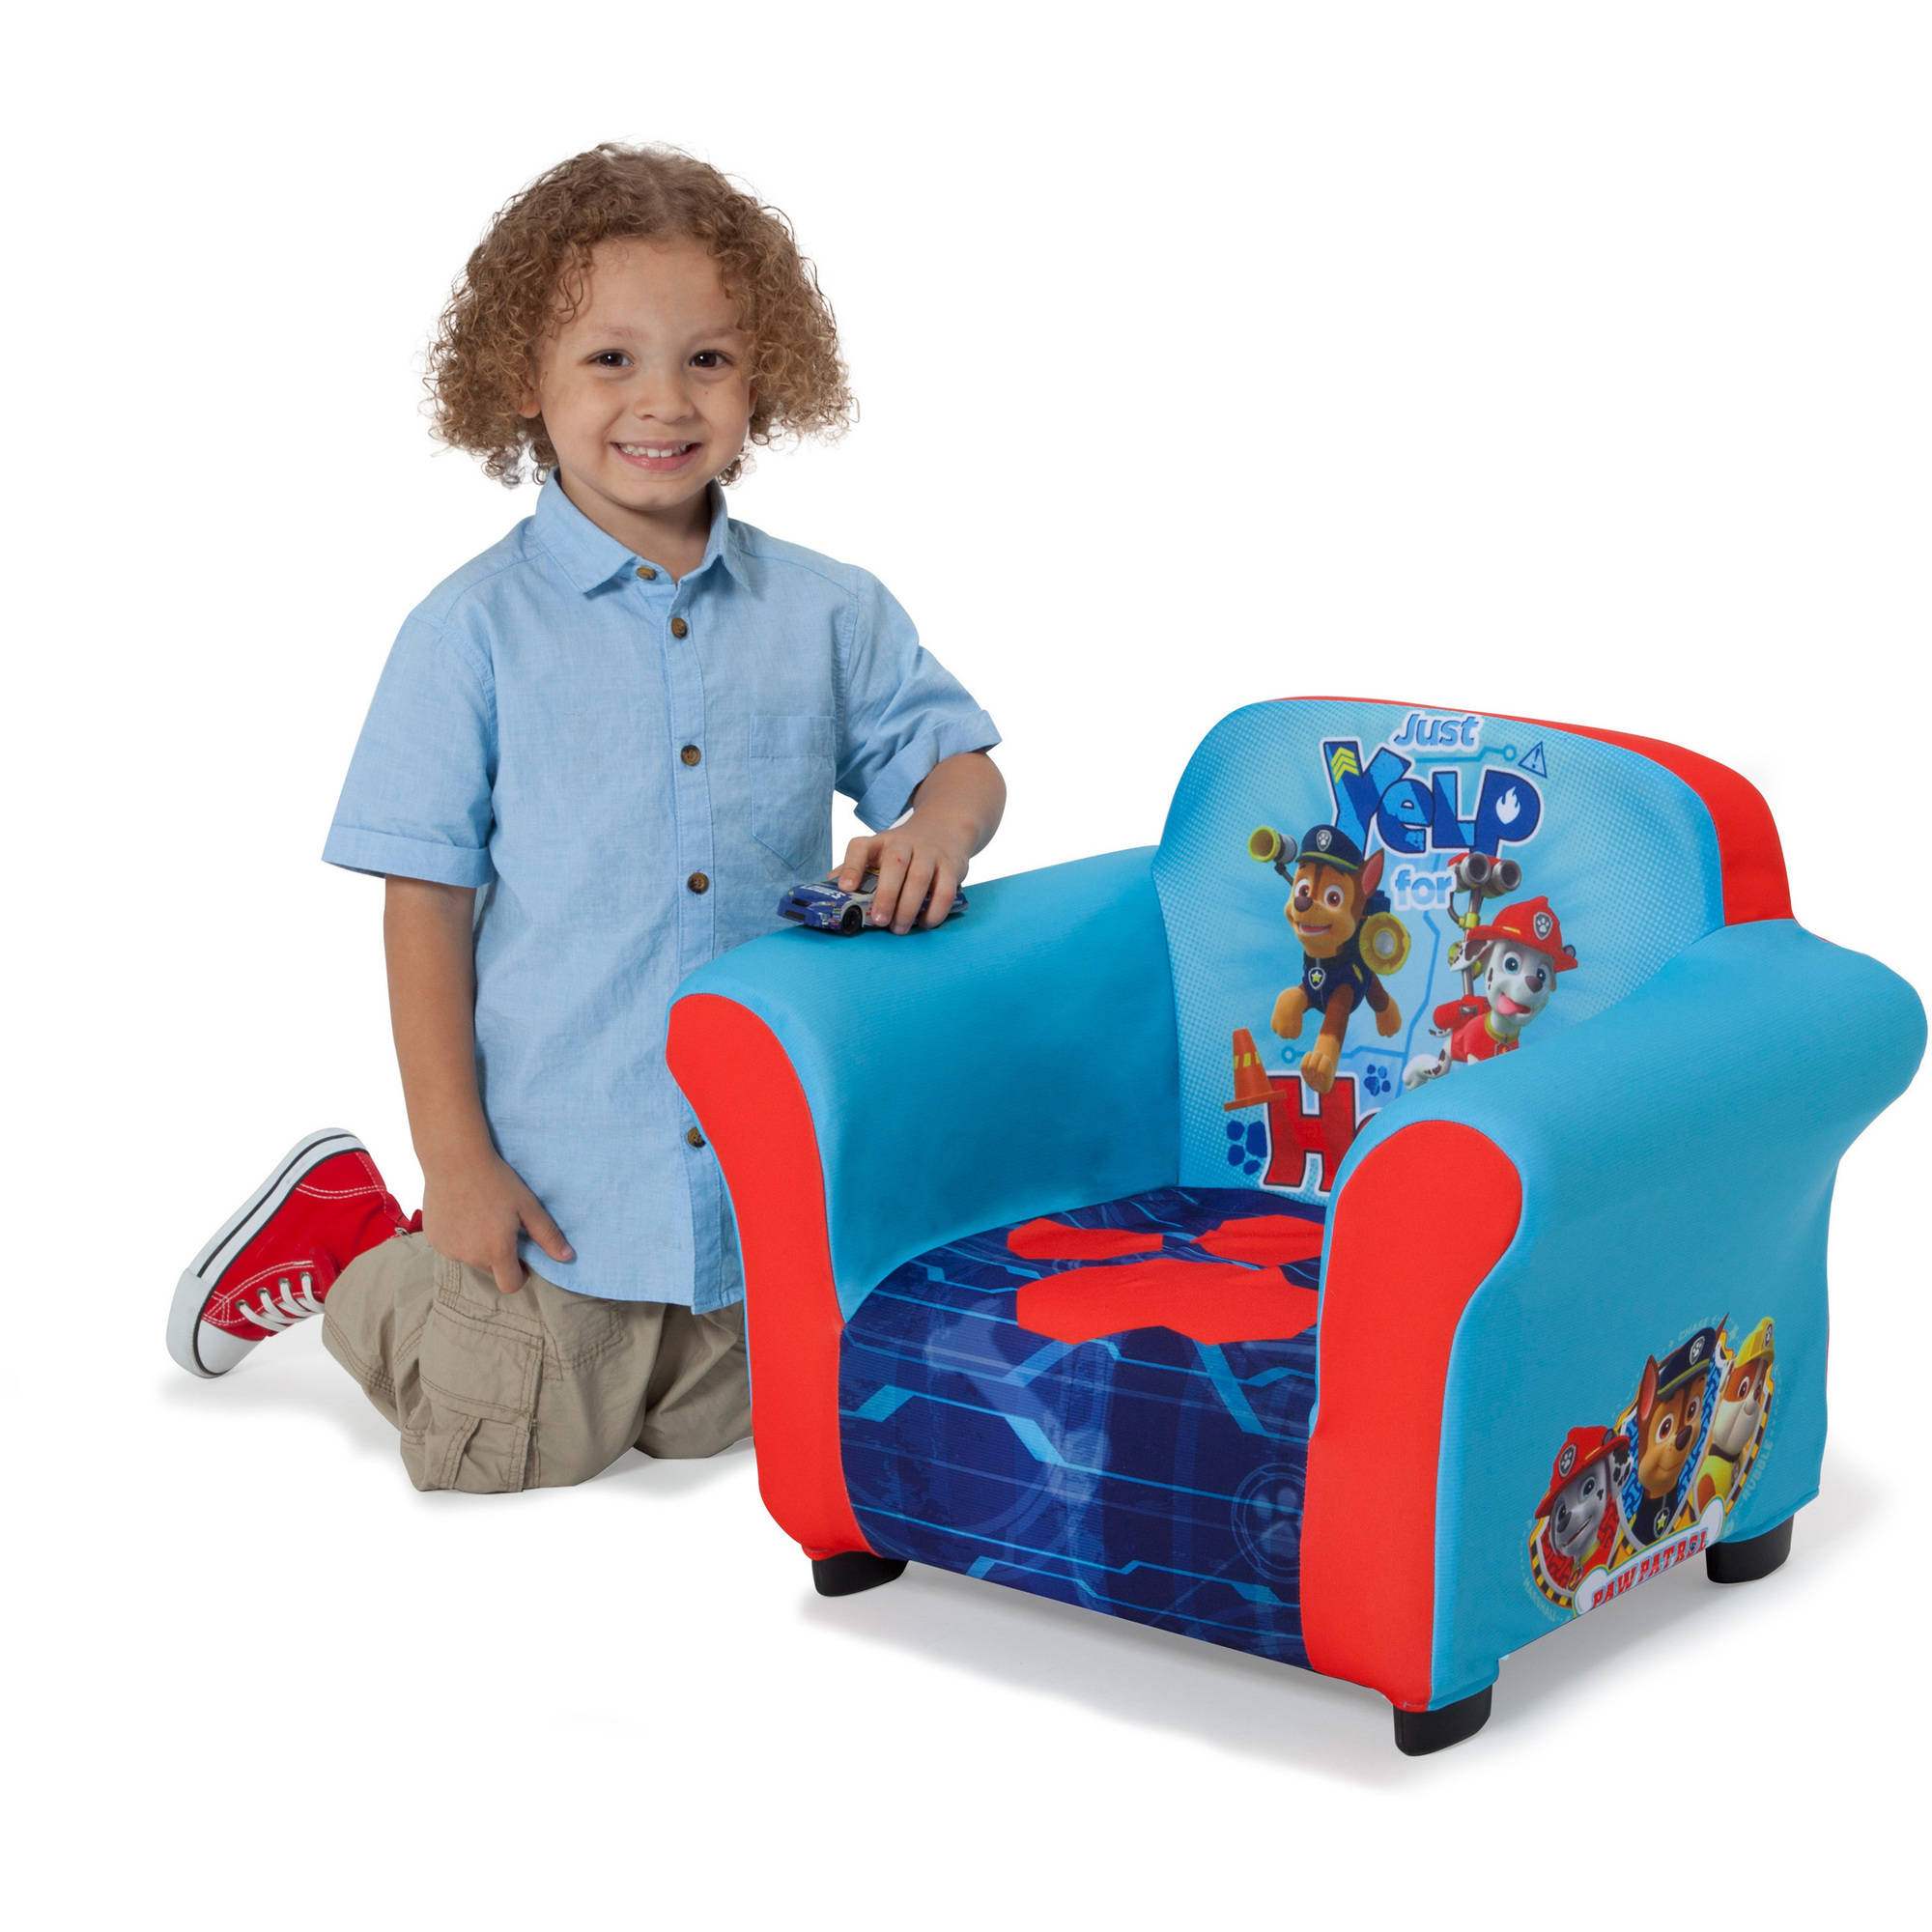 Dora The Explorer Baby Toddler Ride On Float Seat Swim